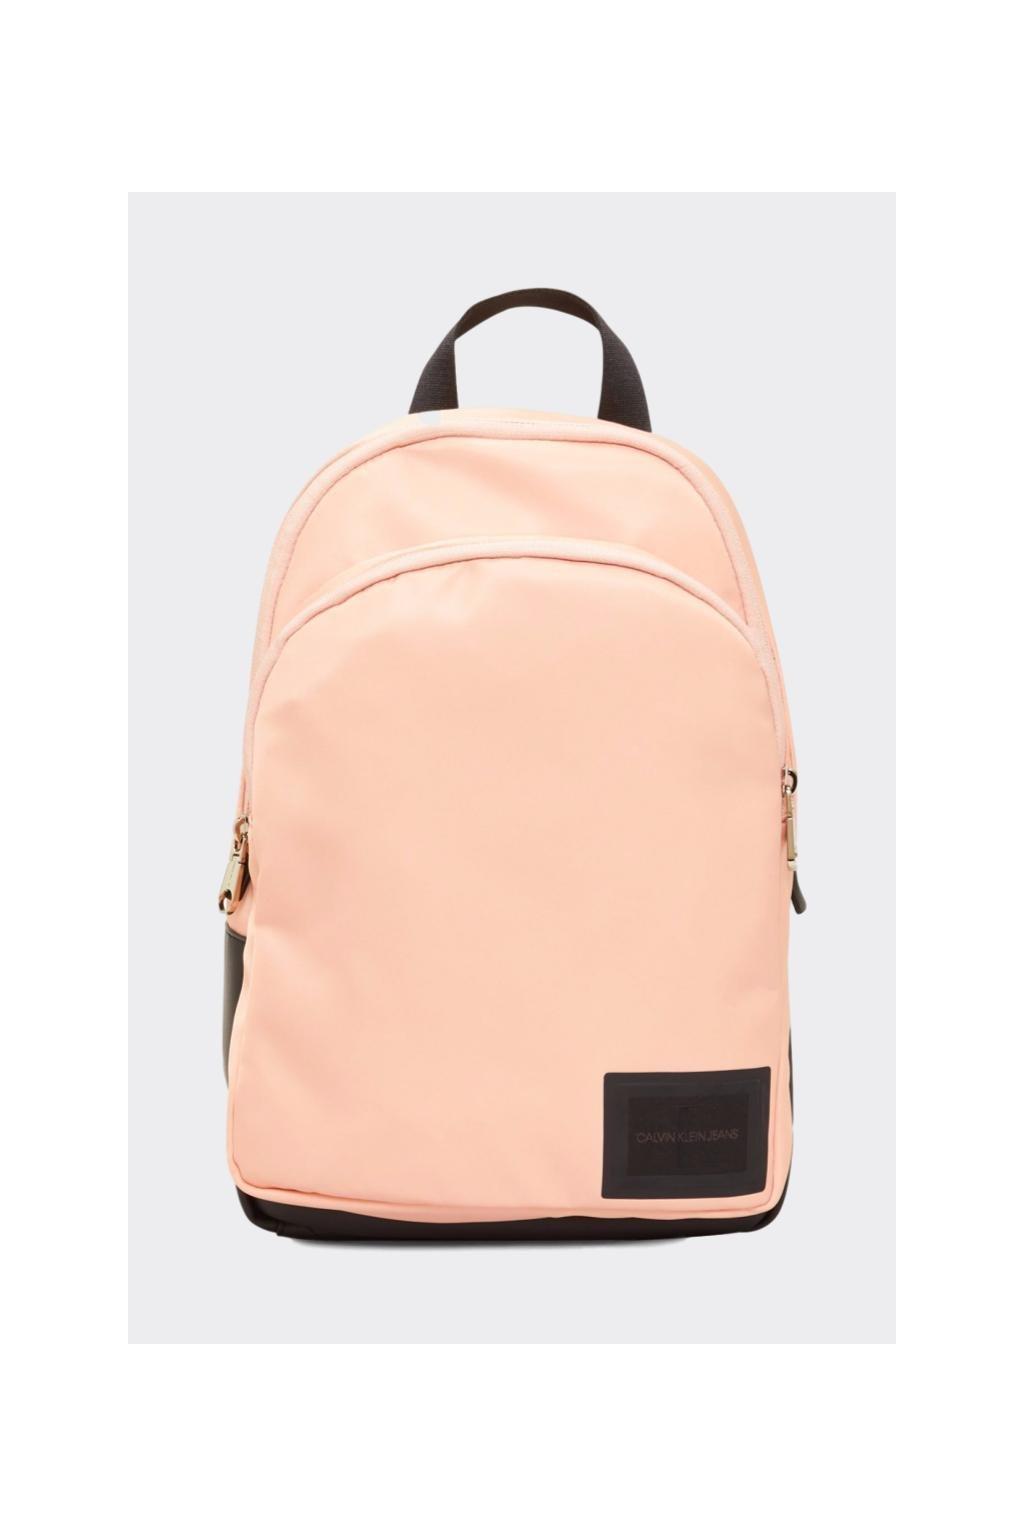 Calvin Klein Jeans batoh dámský - růžová